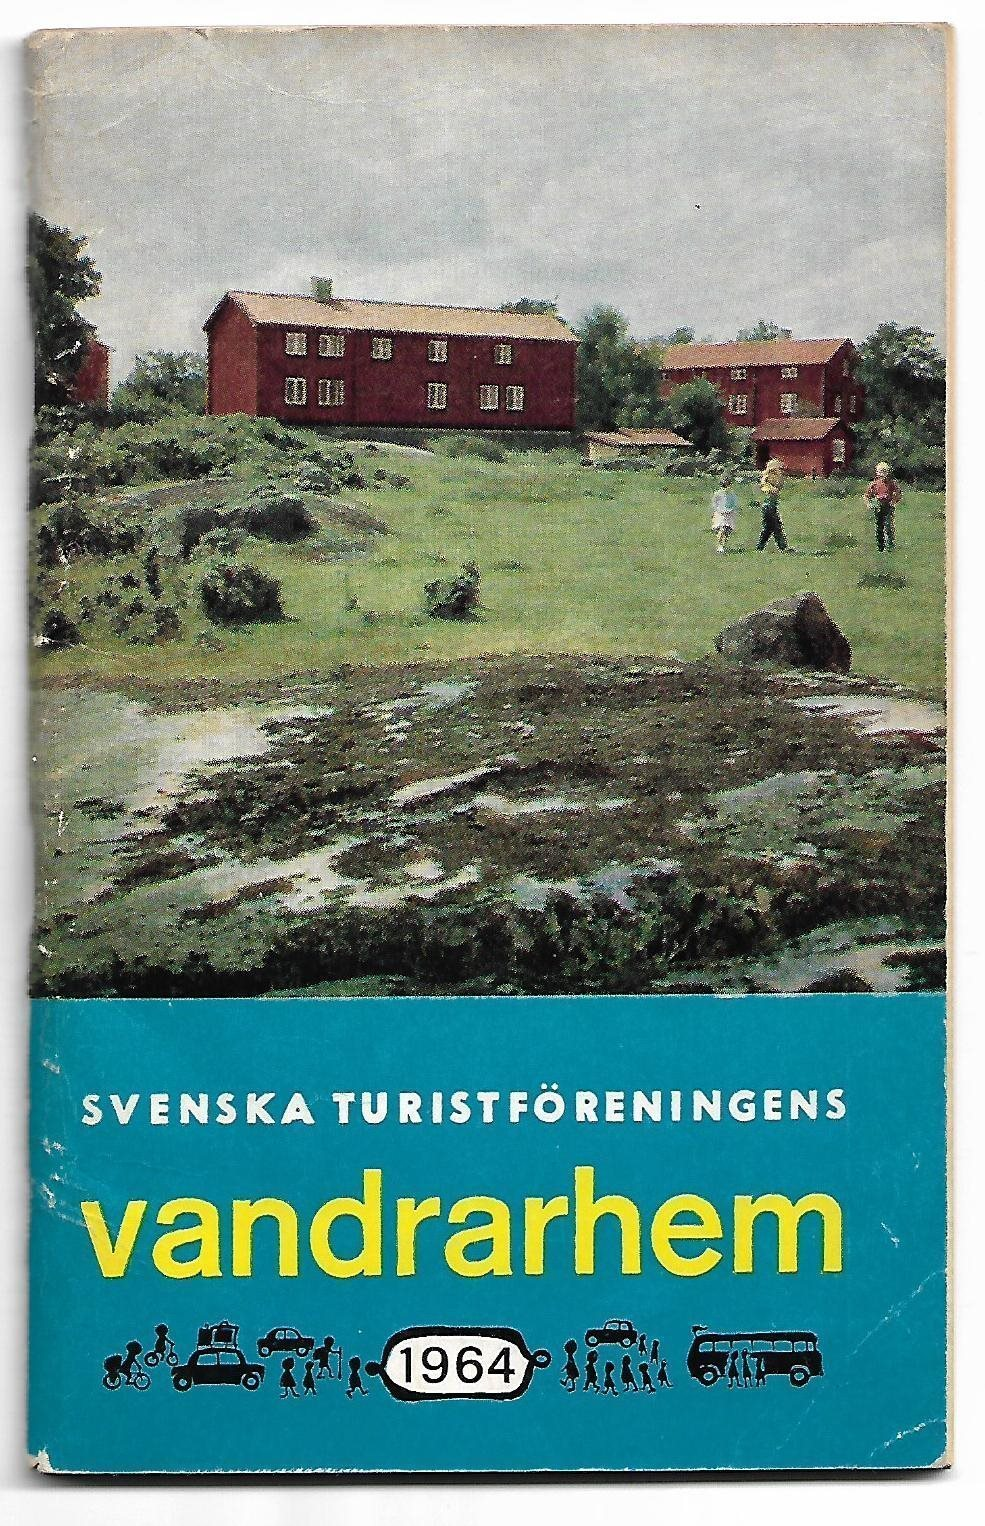 stf vandrarhem karta STF VANDRARHEM 1964. Häfte med karta. Bra skick. (313177630) ᐈ  stf vandrarhem karta